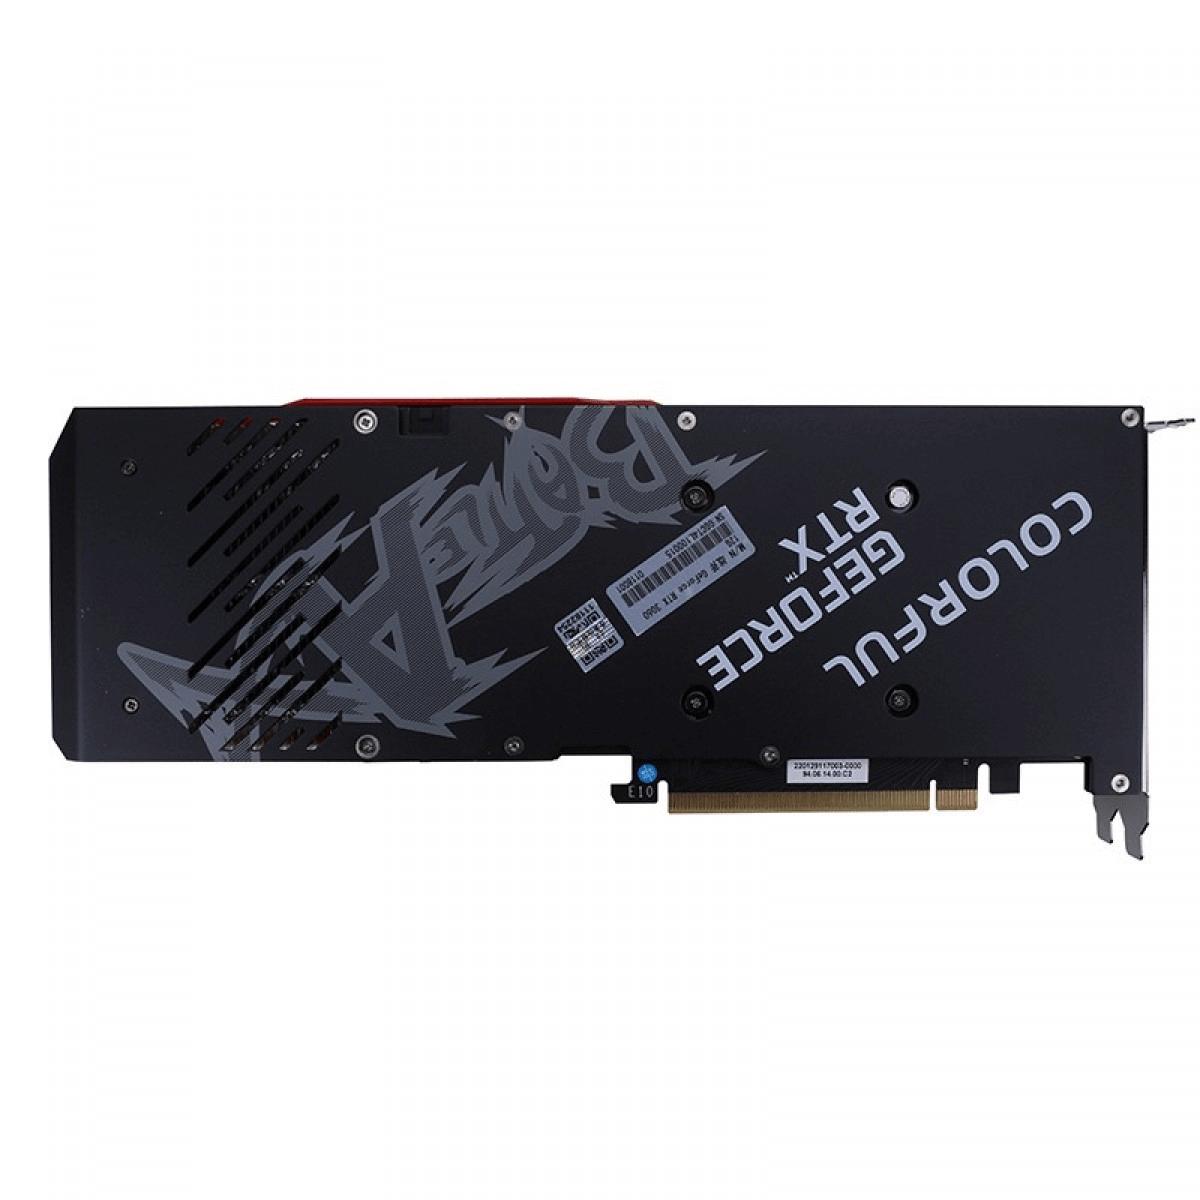 Placa de Video Colorful RTX 3060 NB 12GB GDDR6 (G-I3060 NB-V)